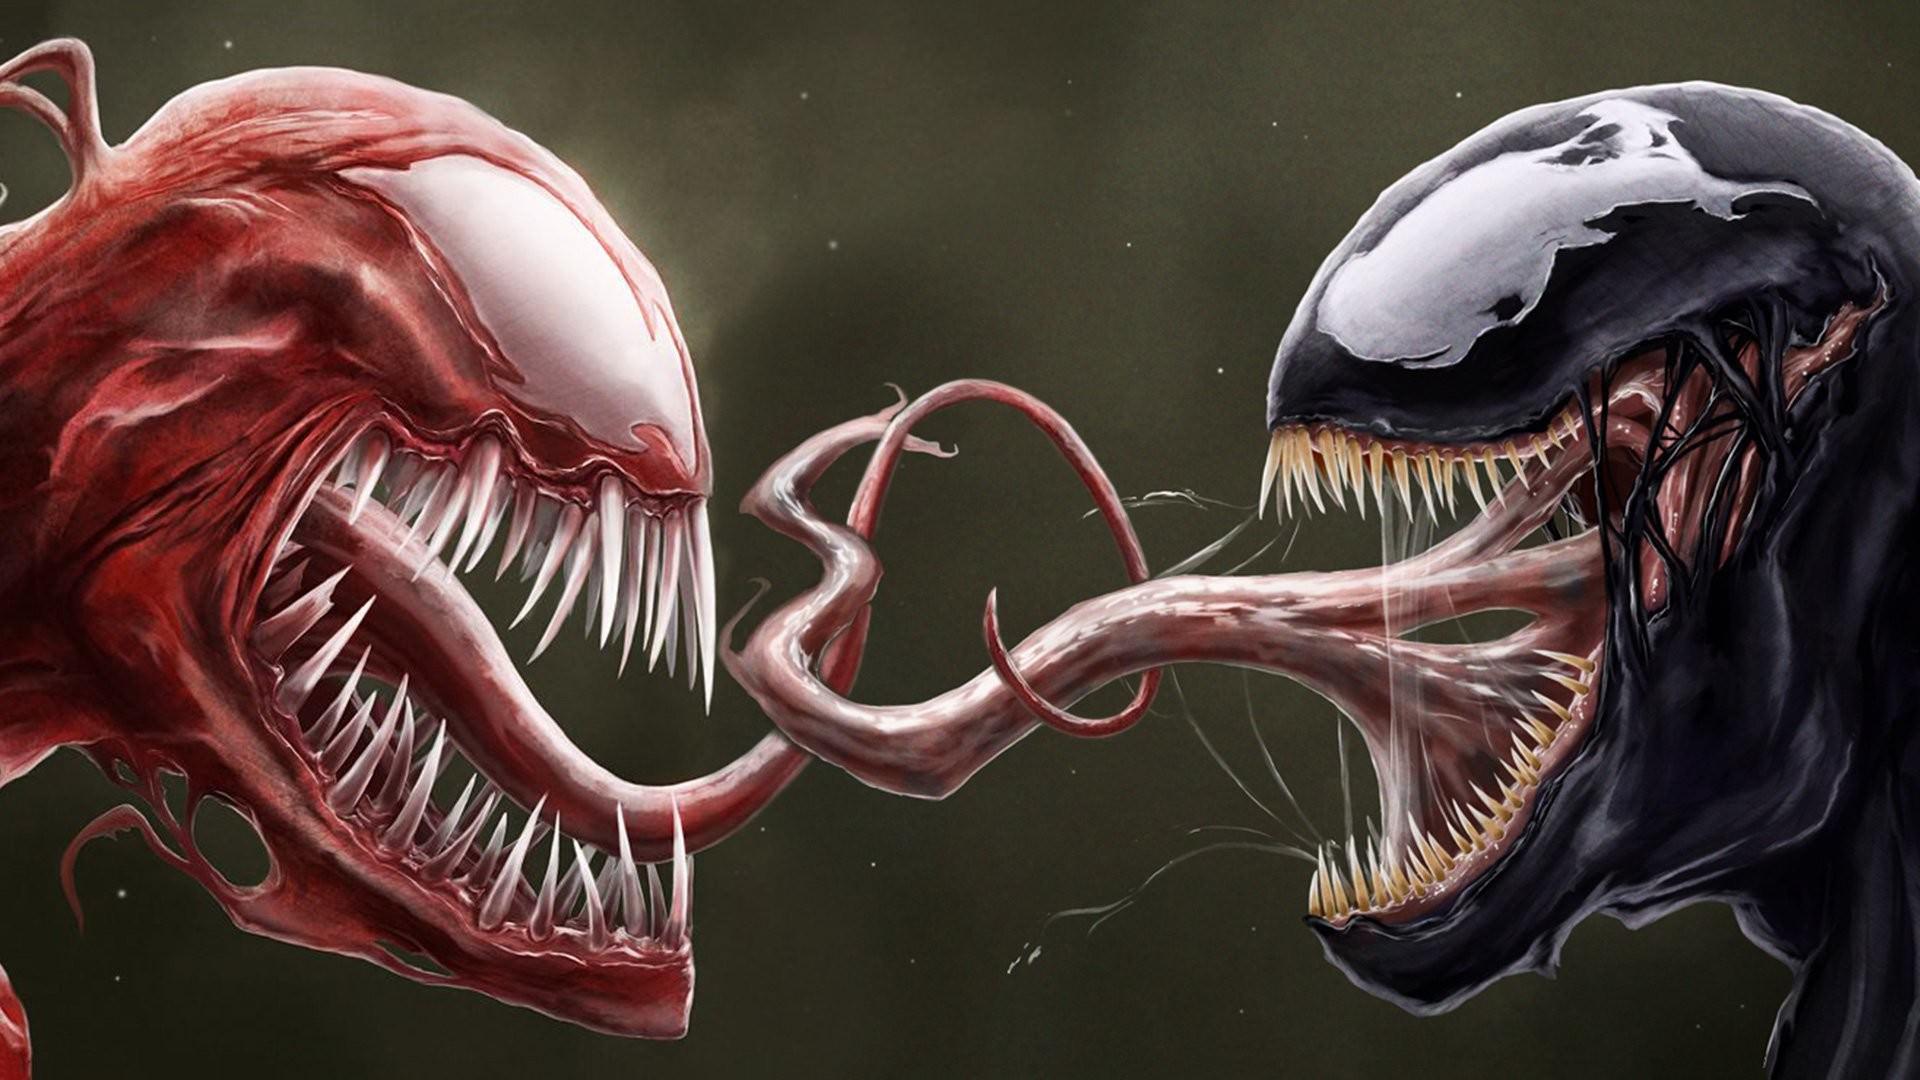 Venom Wallpapers Top Free Venom Backgrounds Wallpaperaccess